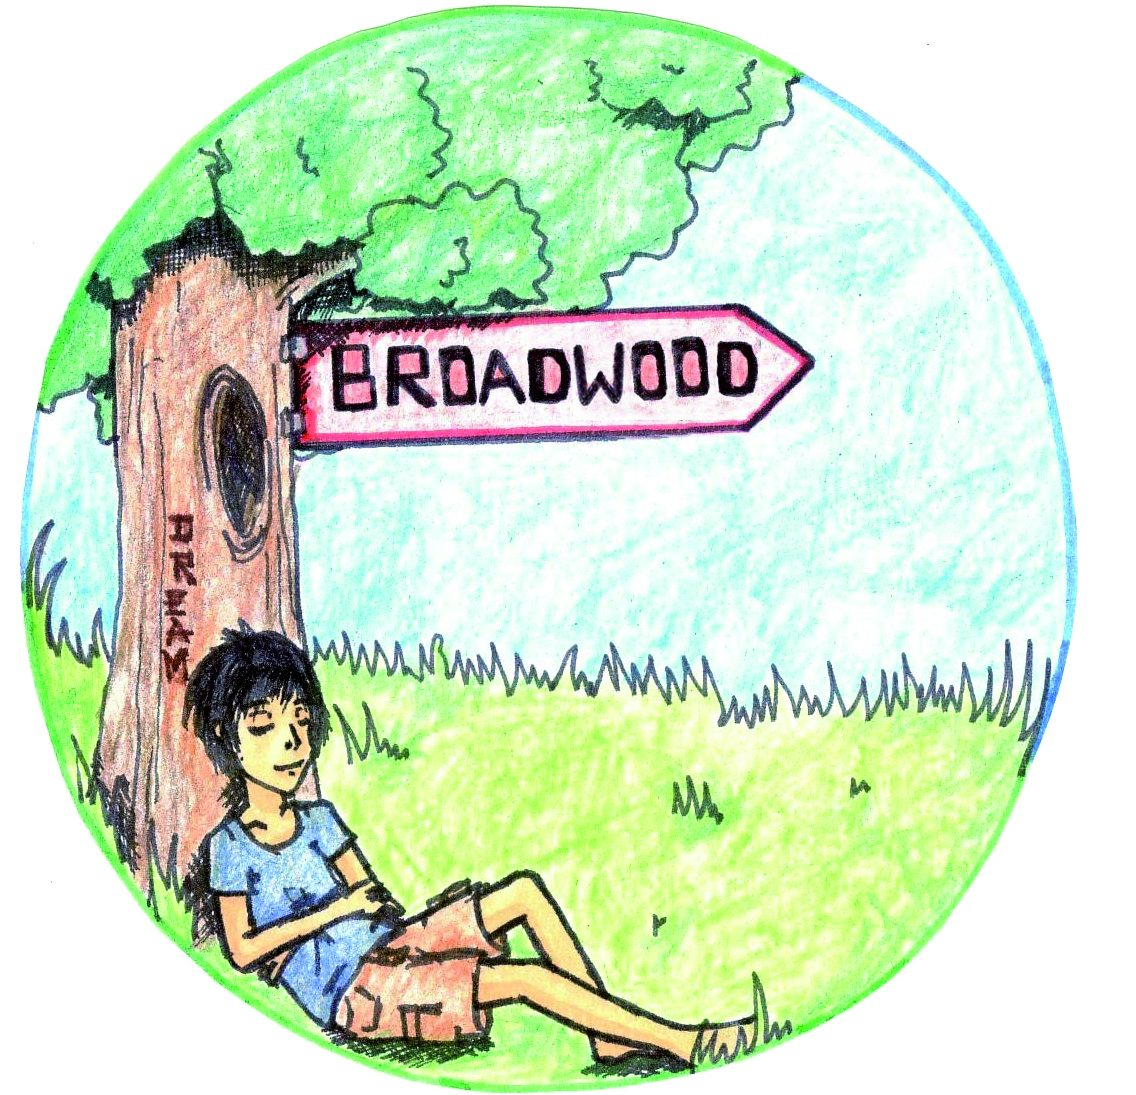 Broadwood